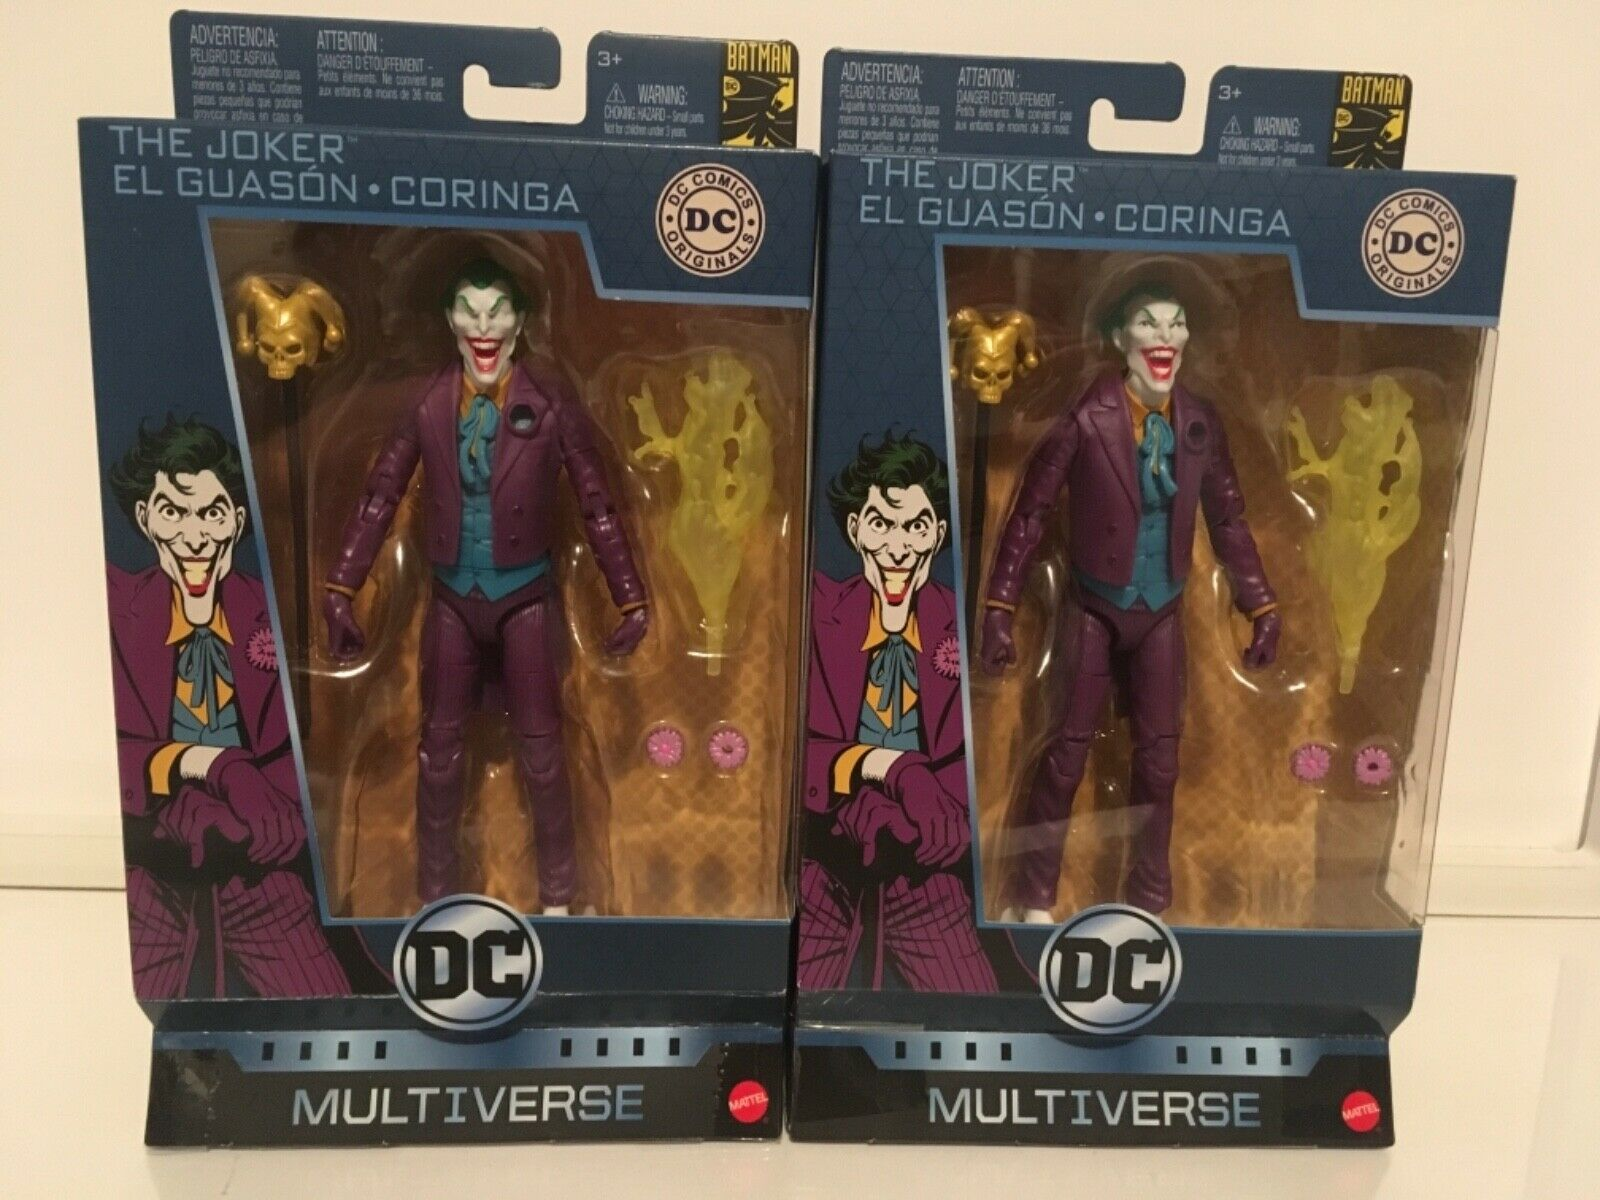 DC Multiverse Joker 80 years DEFECT (no eyes pupils) and Regular Action Figure